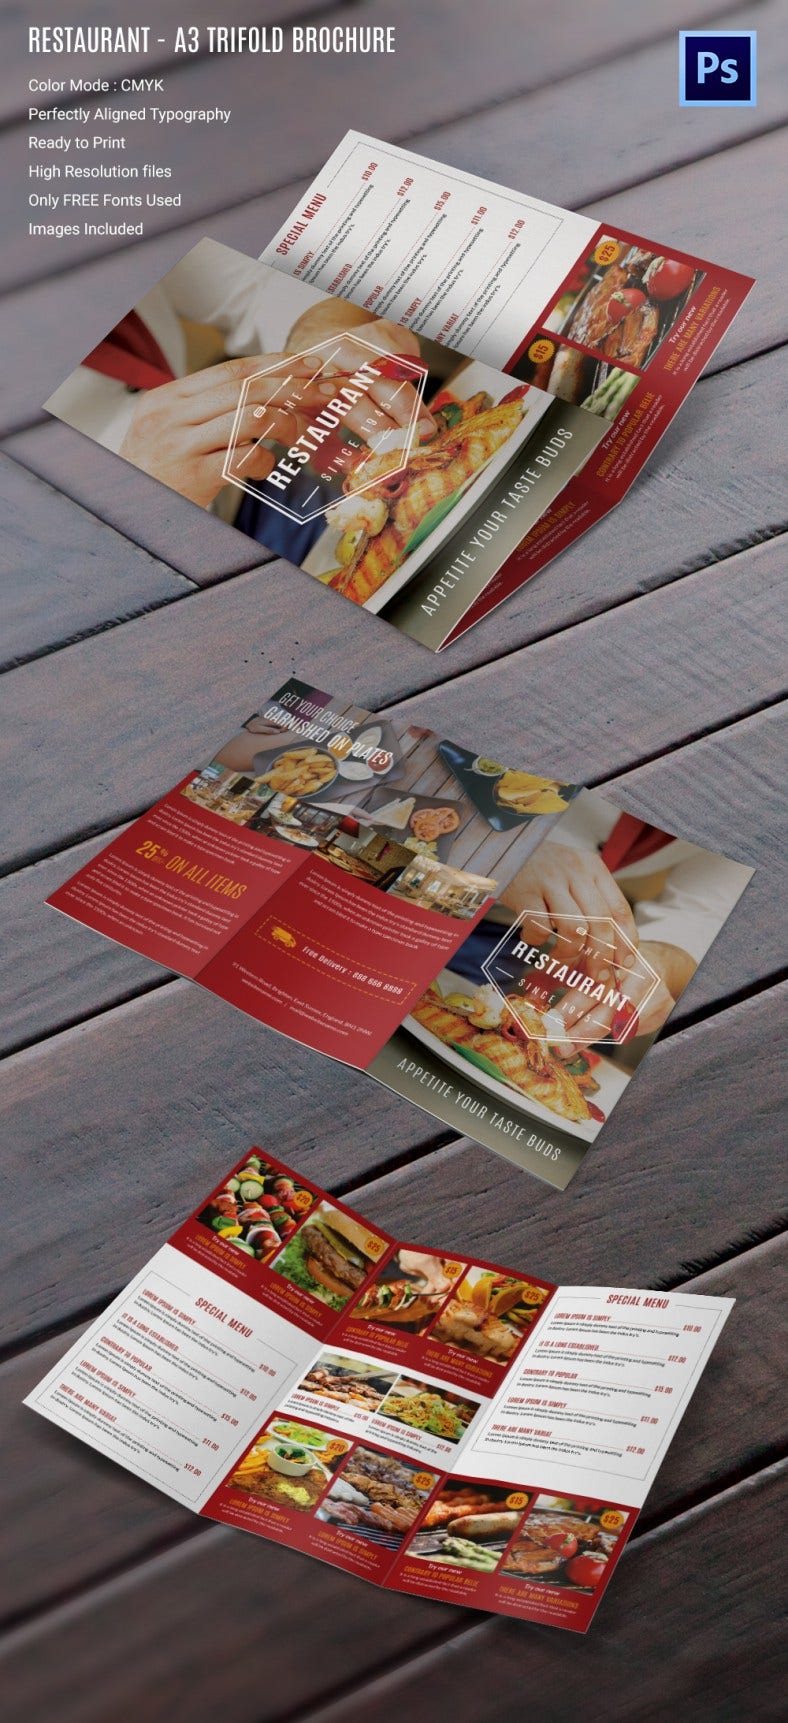 27 Restaurant Brochure Templates Free PSD EPS AI InDesign – Restaurant Brochure Templates